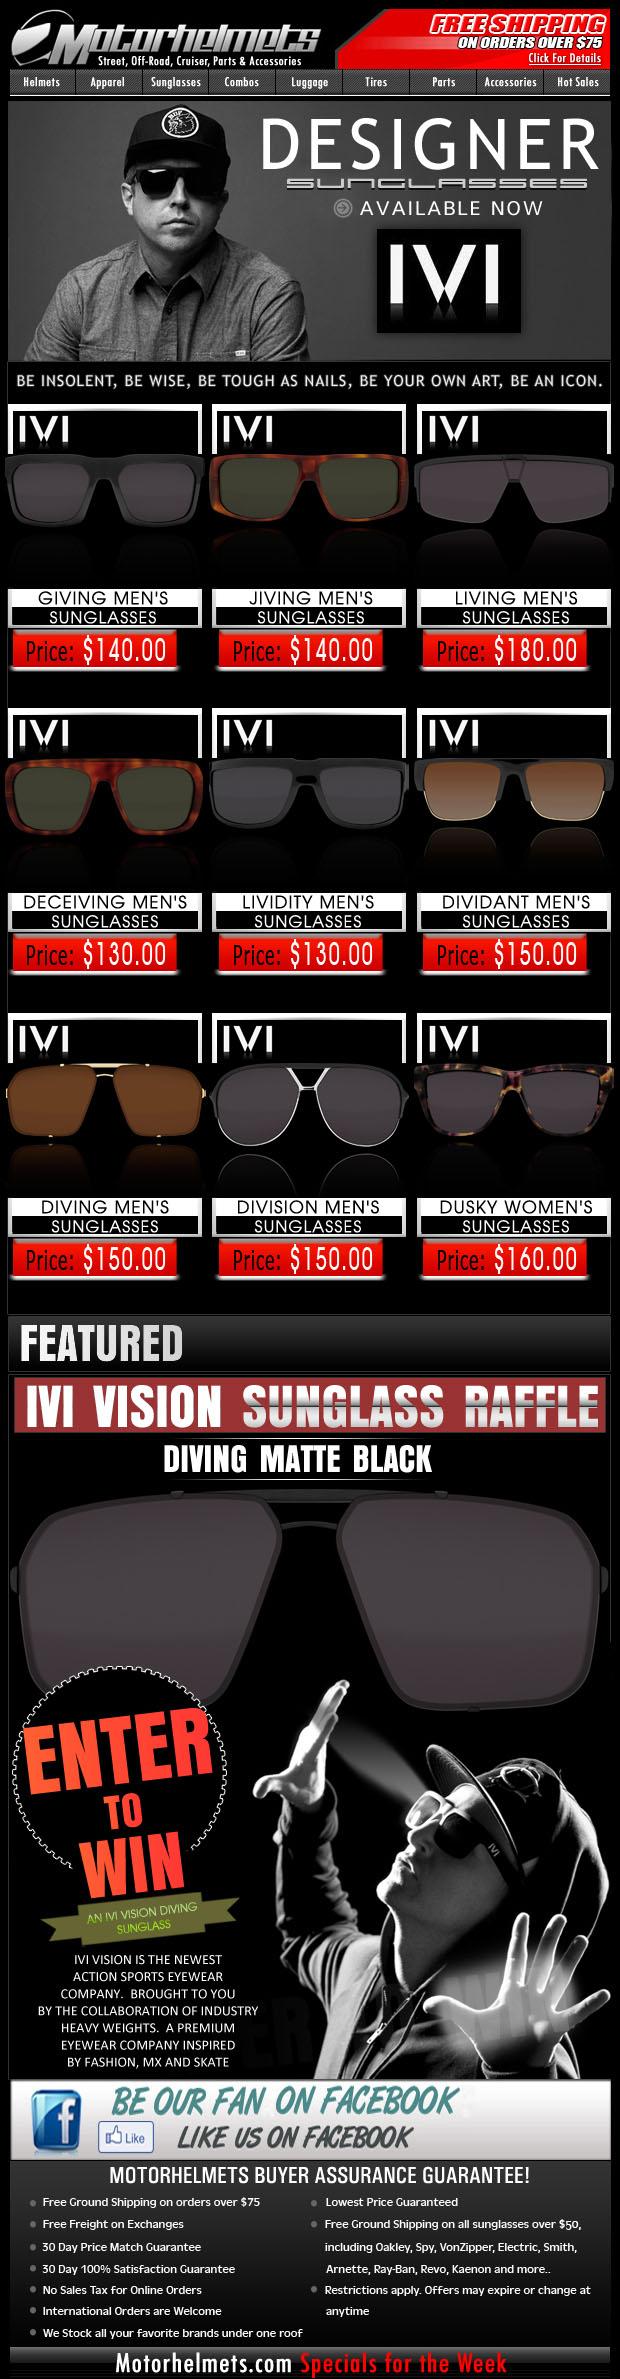 IVI Vision Sunglass Raffle - Win the IVI Vision Diving Sunglasses!